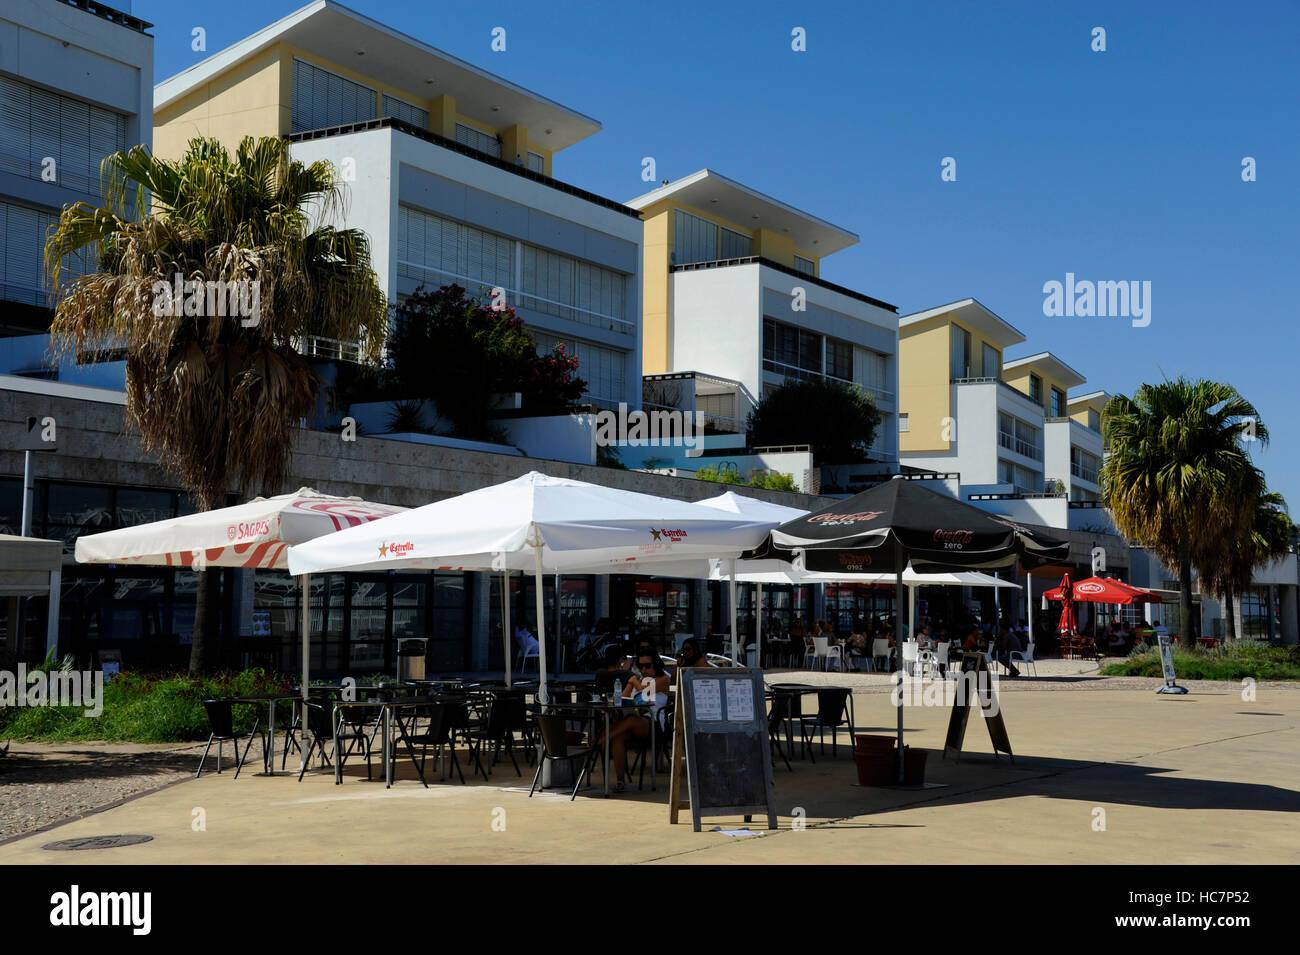 Cafe, restaurant, Passeio Neptuno, Parque das Nacoes, Nation's Park, Lisboa, Lisbon, Portugal - Stock Image